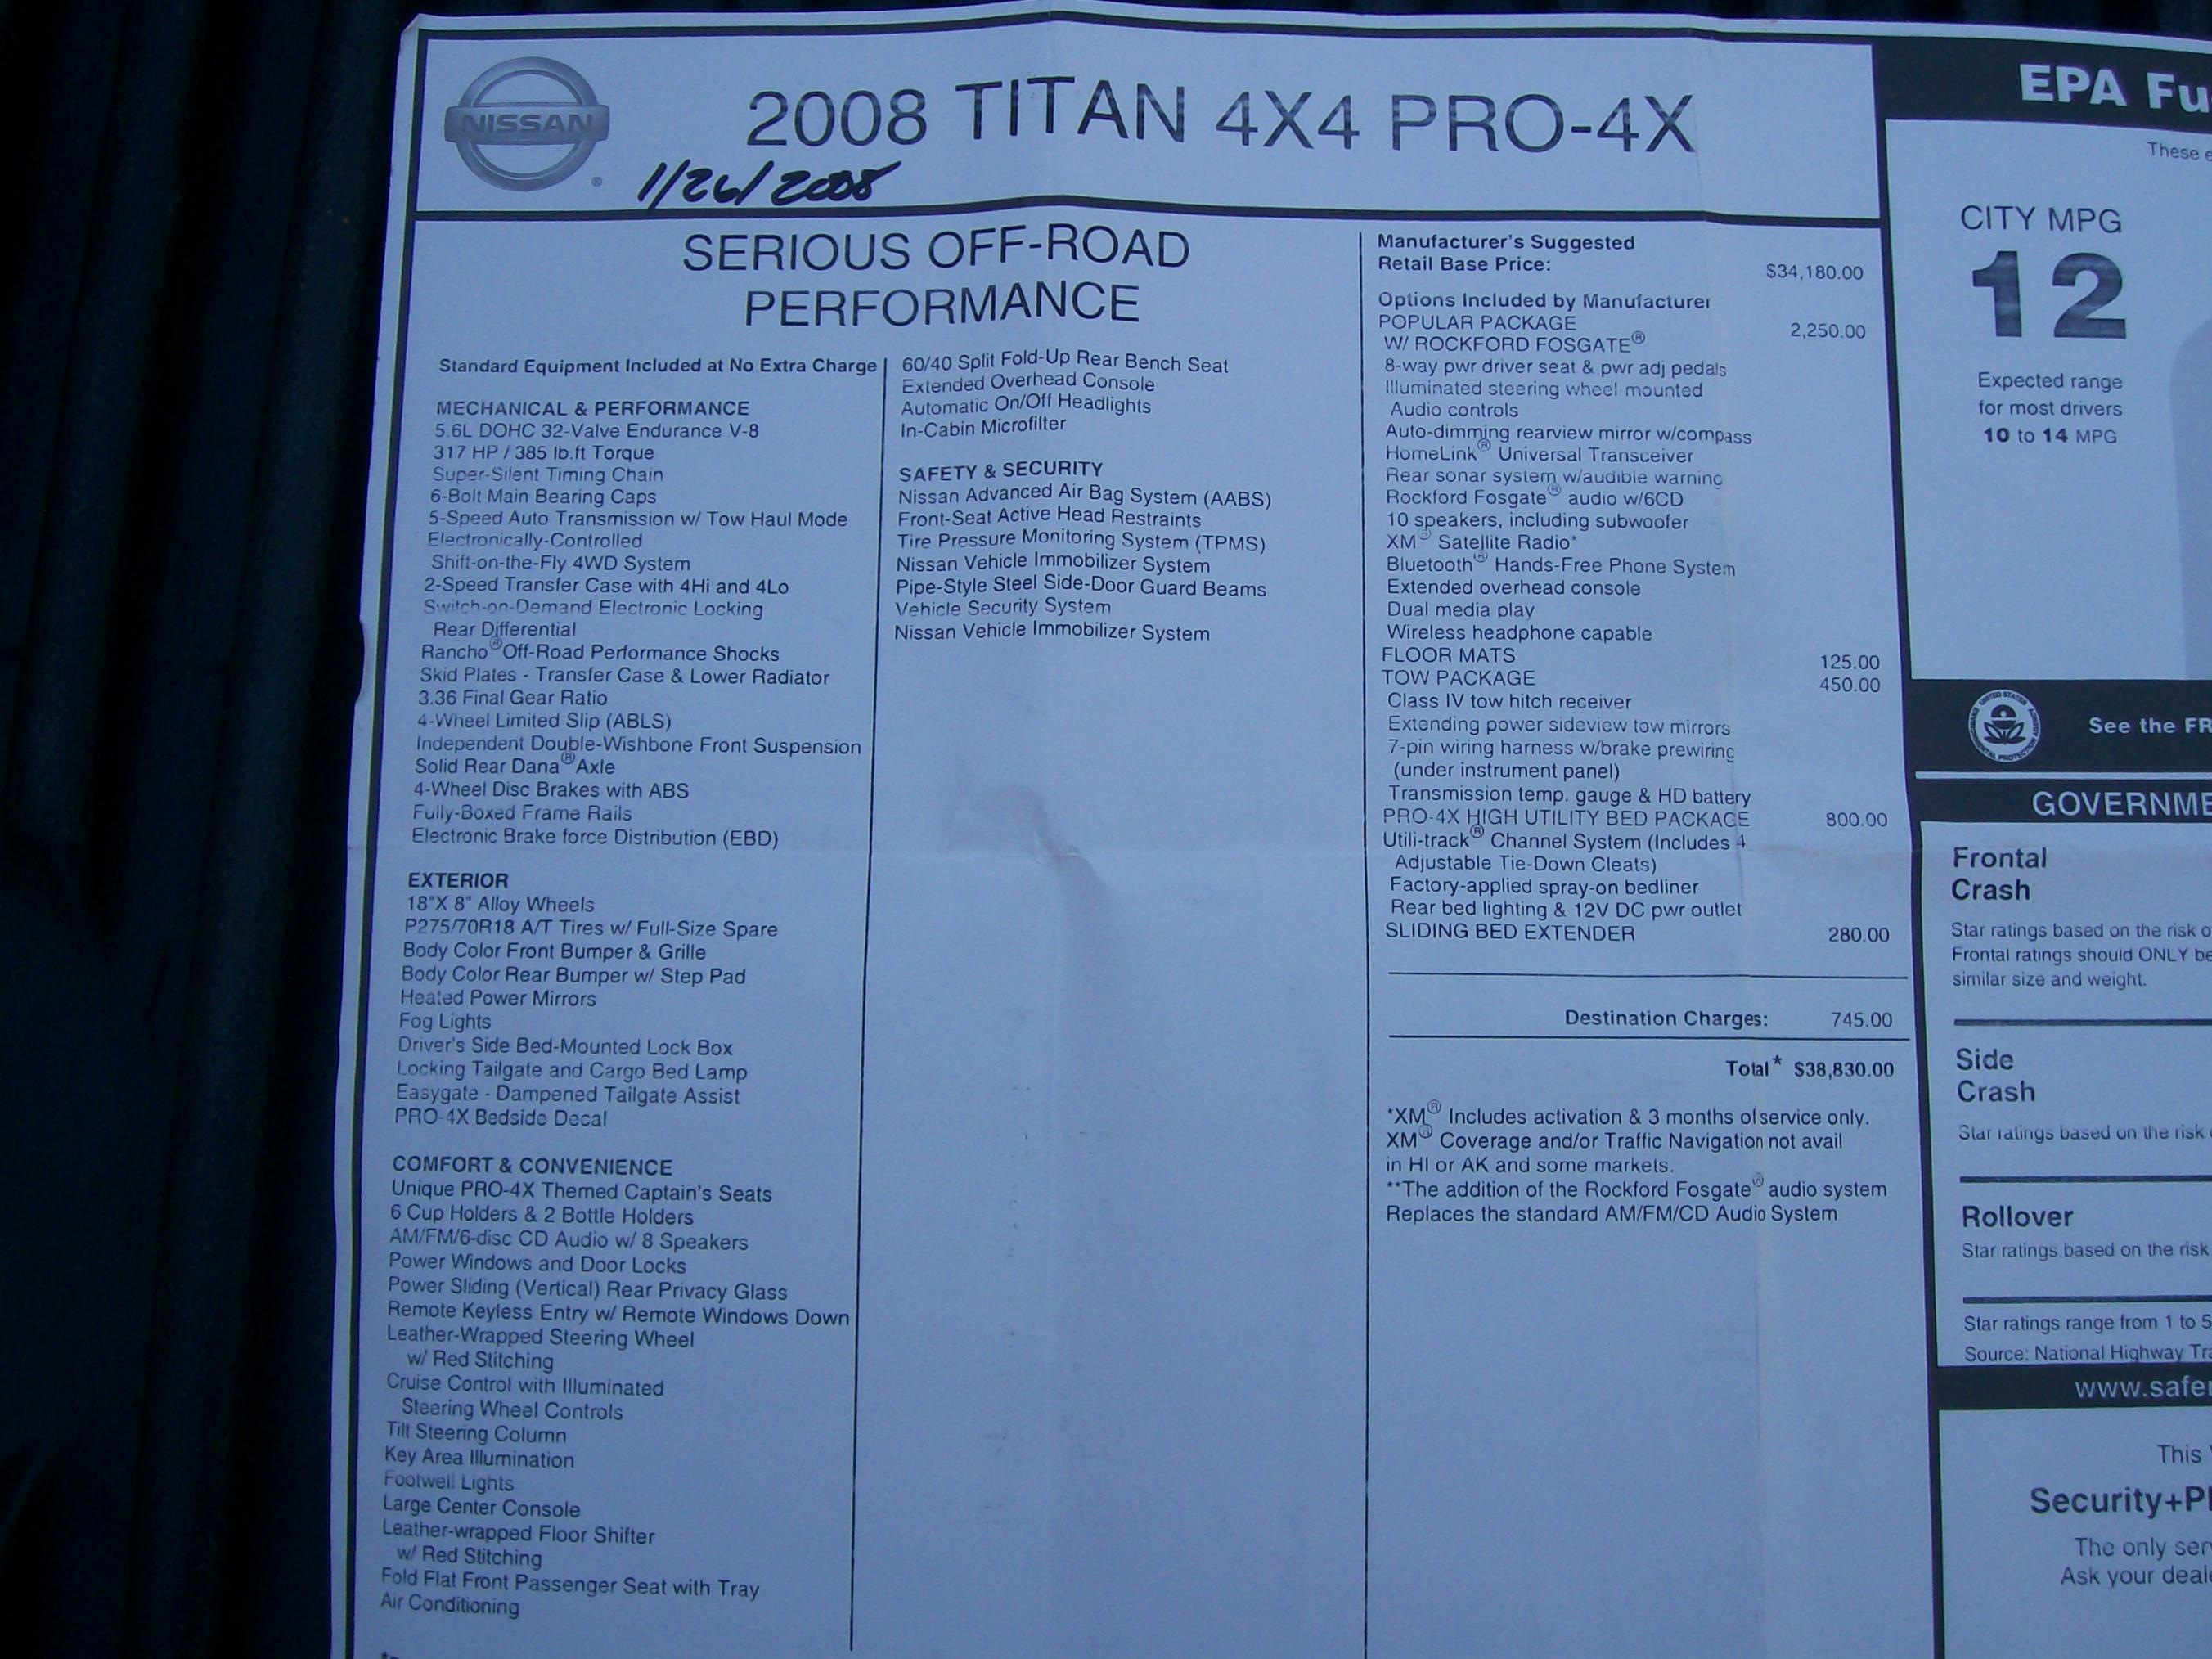 2008 Nissan Titan Pro-4x 4x4 FOR SALE-101_2887.jpg